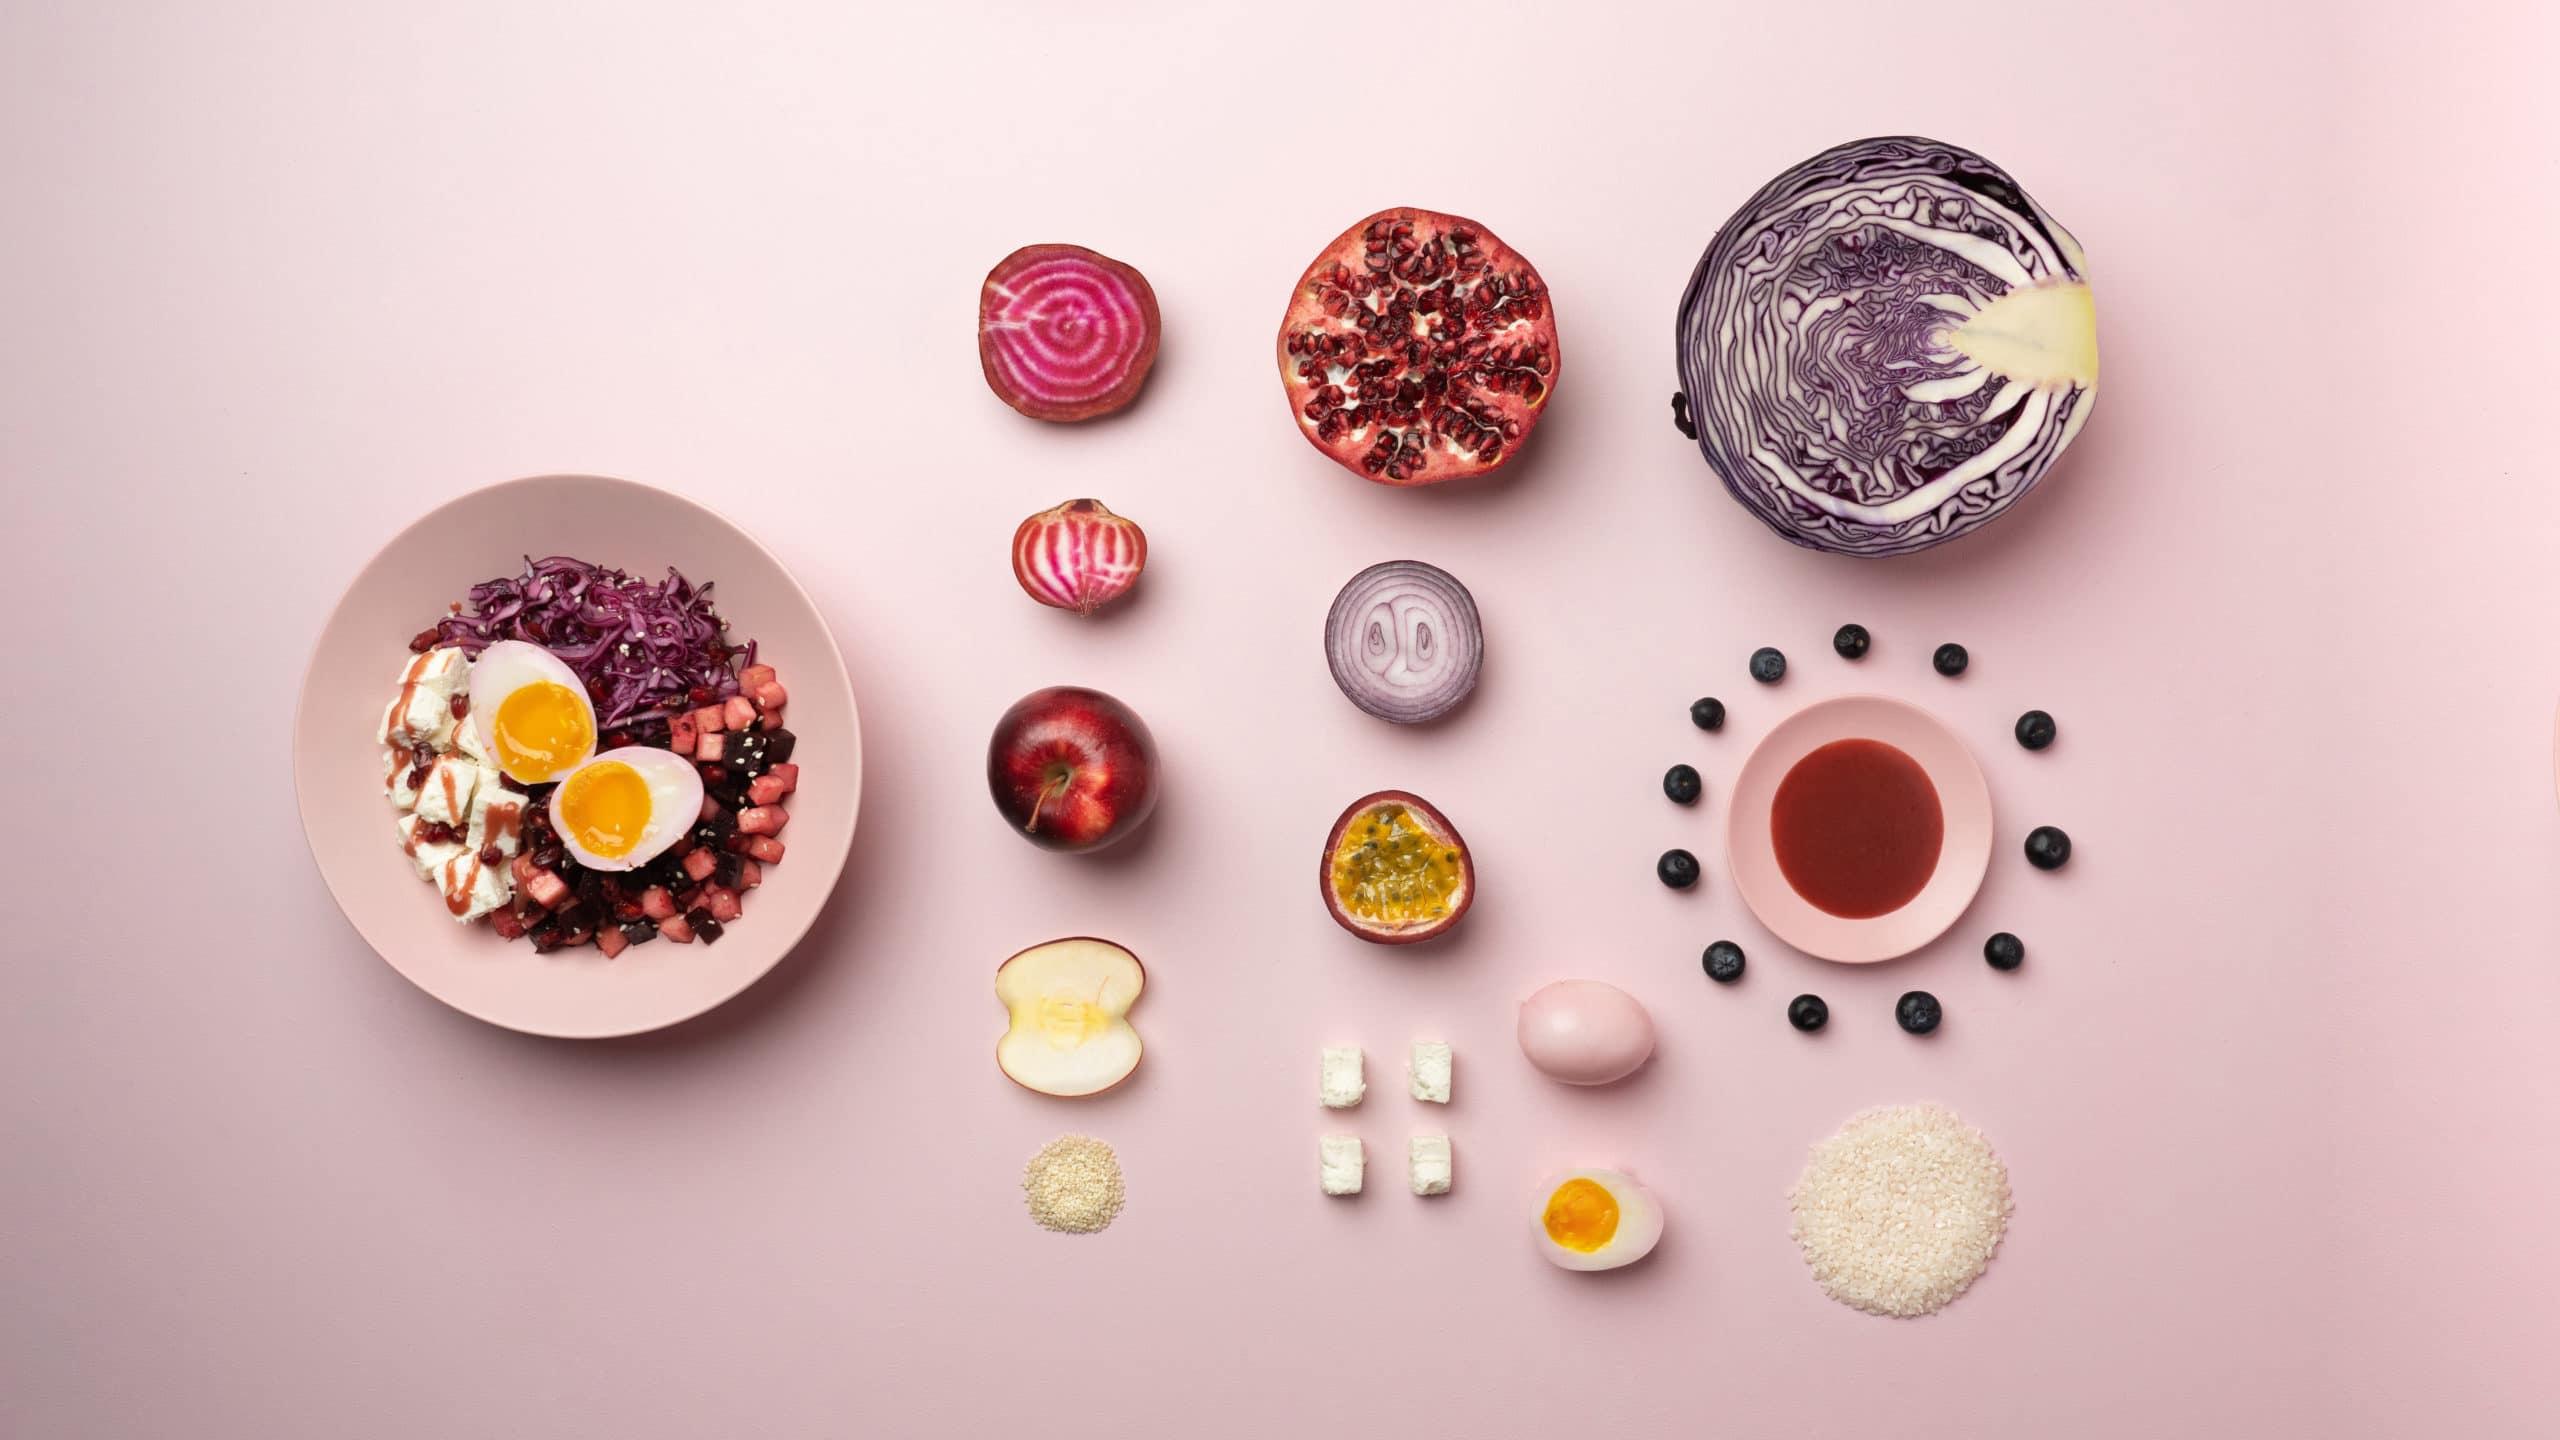 Decomposition du bowl PinkMe Moko Moko Gardlab